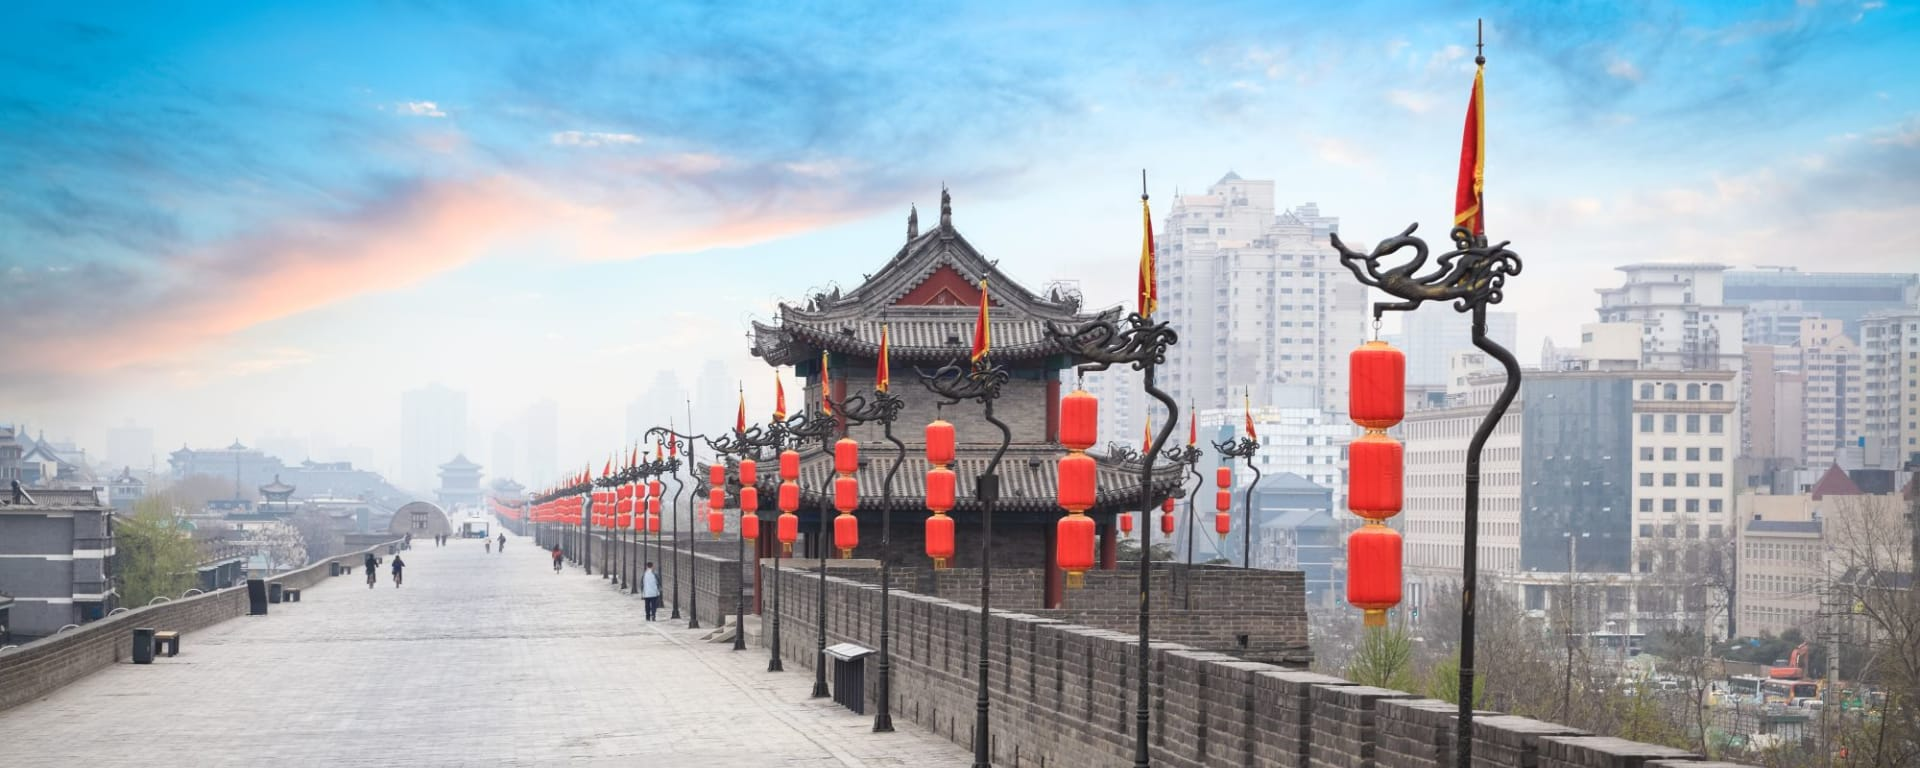 China für Geniesser mit Luxus-Kreuzfahrt auf dem Yangtze ab Peking: Xian Ancient City Wall